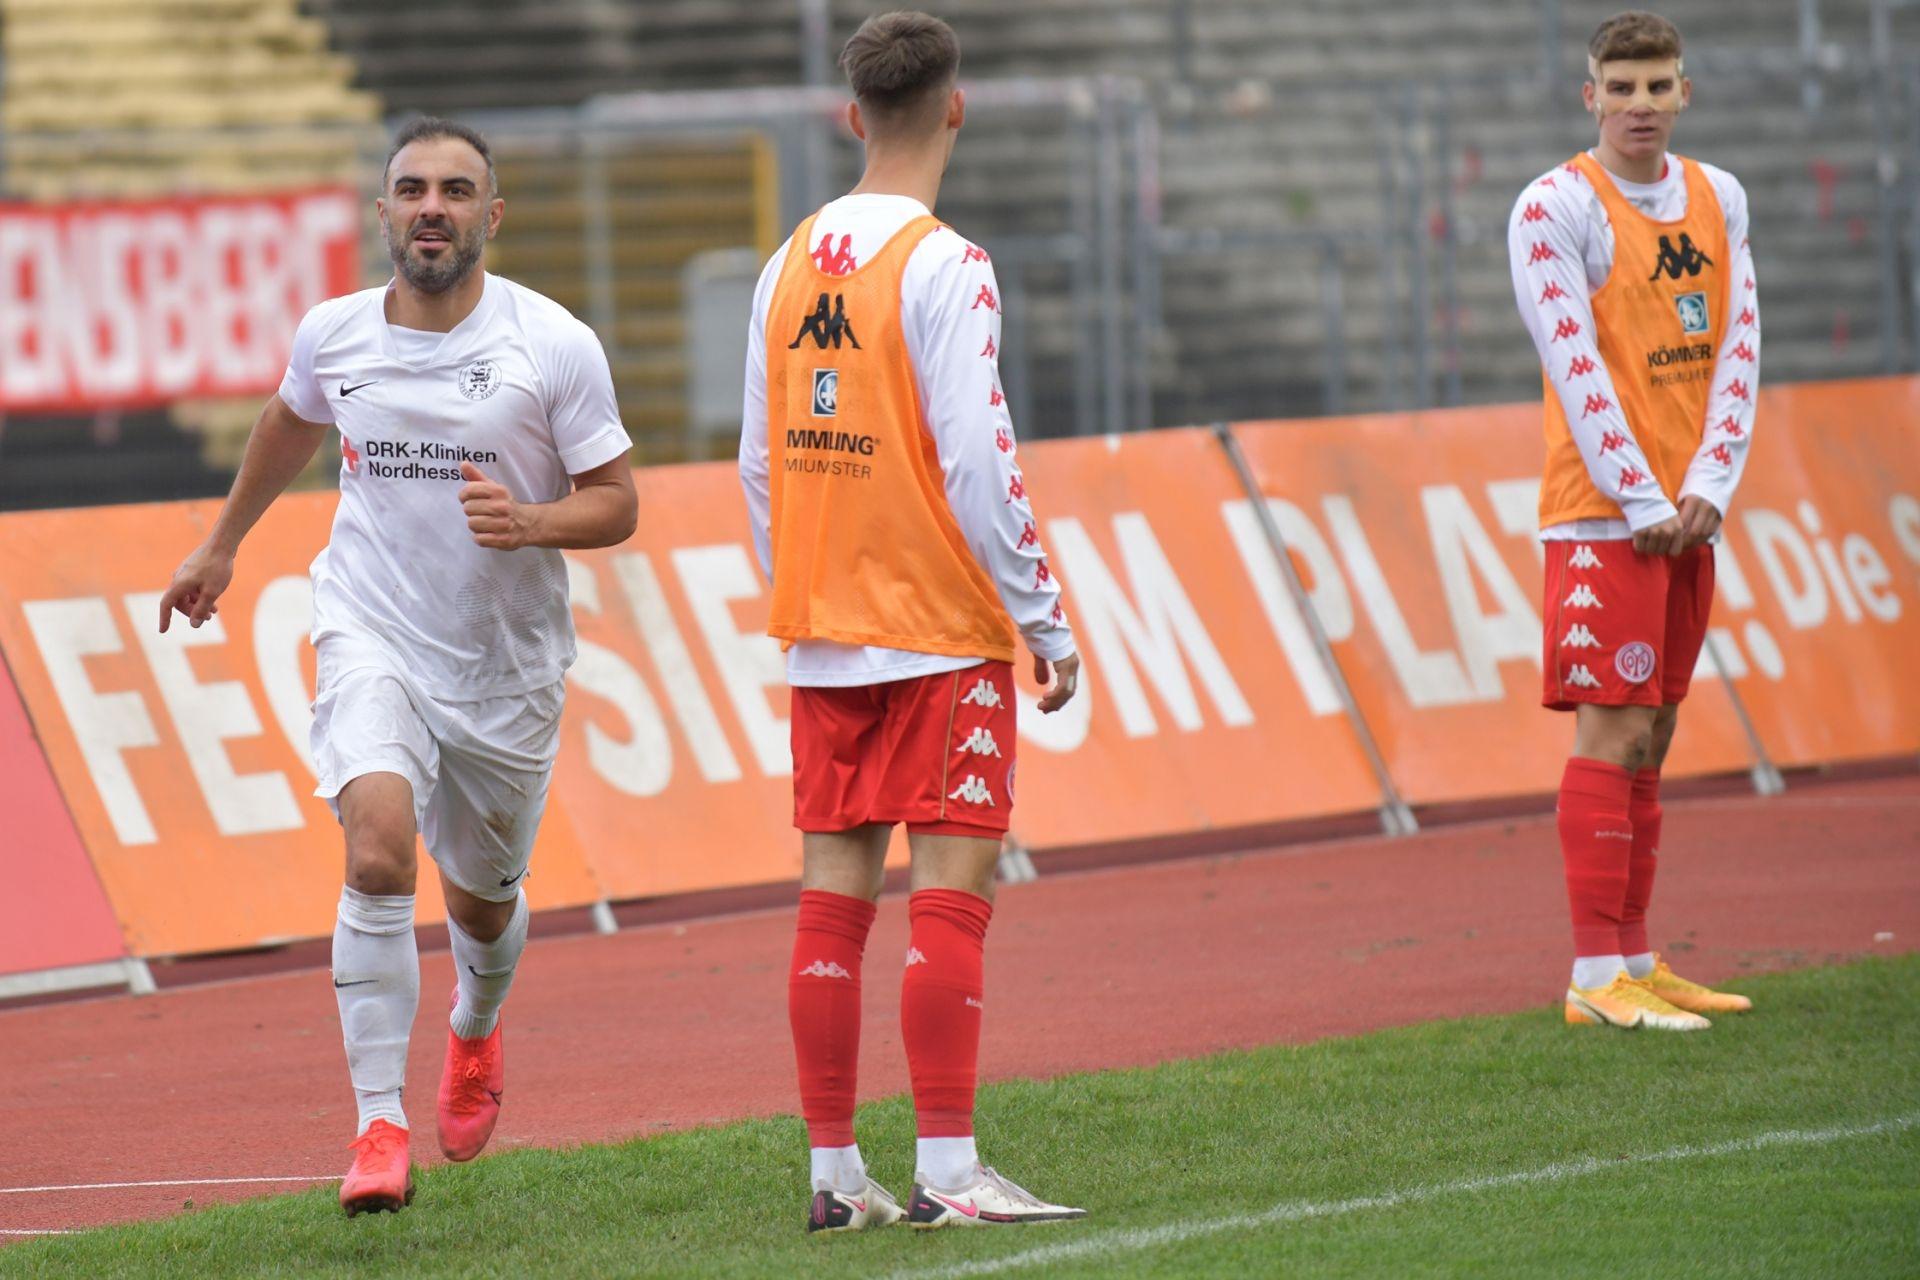 Regionalliga S�dwest 2020/21, KSV Hessen Kassel, 1. FSV Mainz 05 II, Endstand 2:1, Jubel zum 1:0